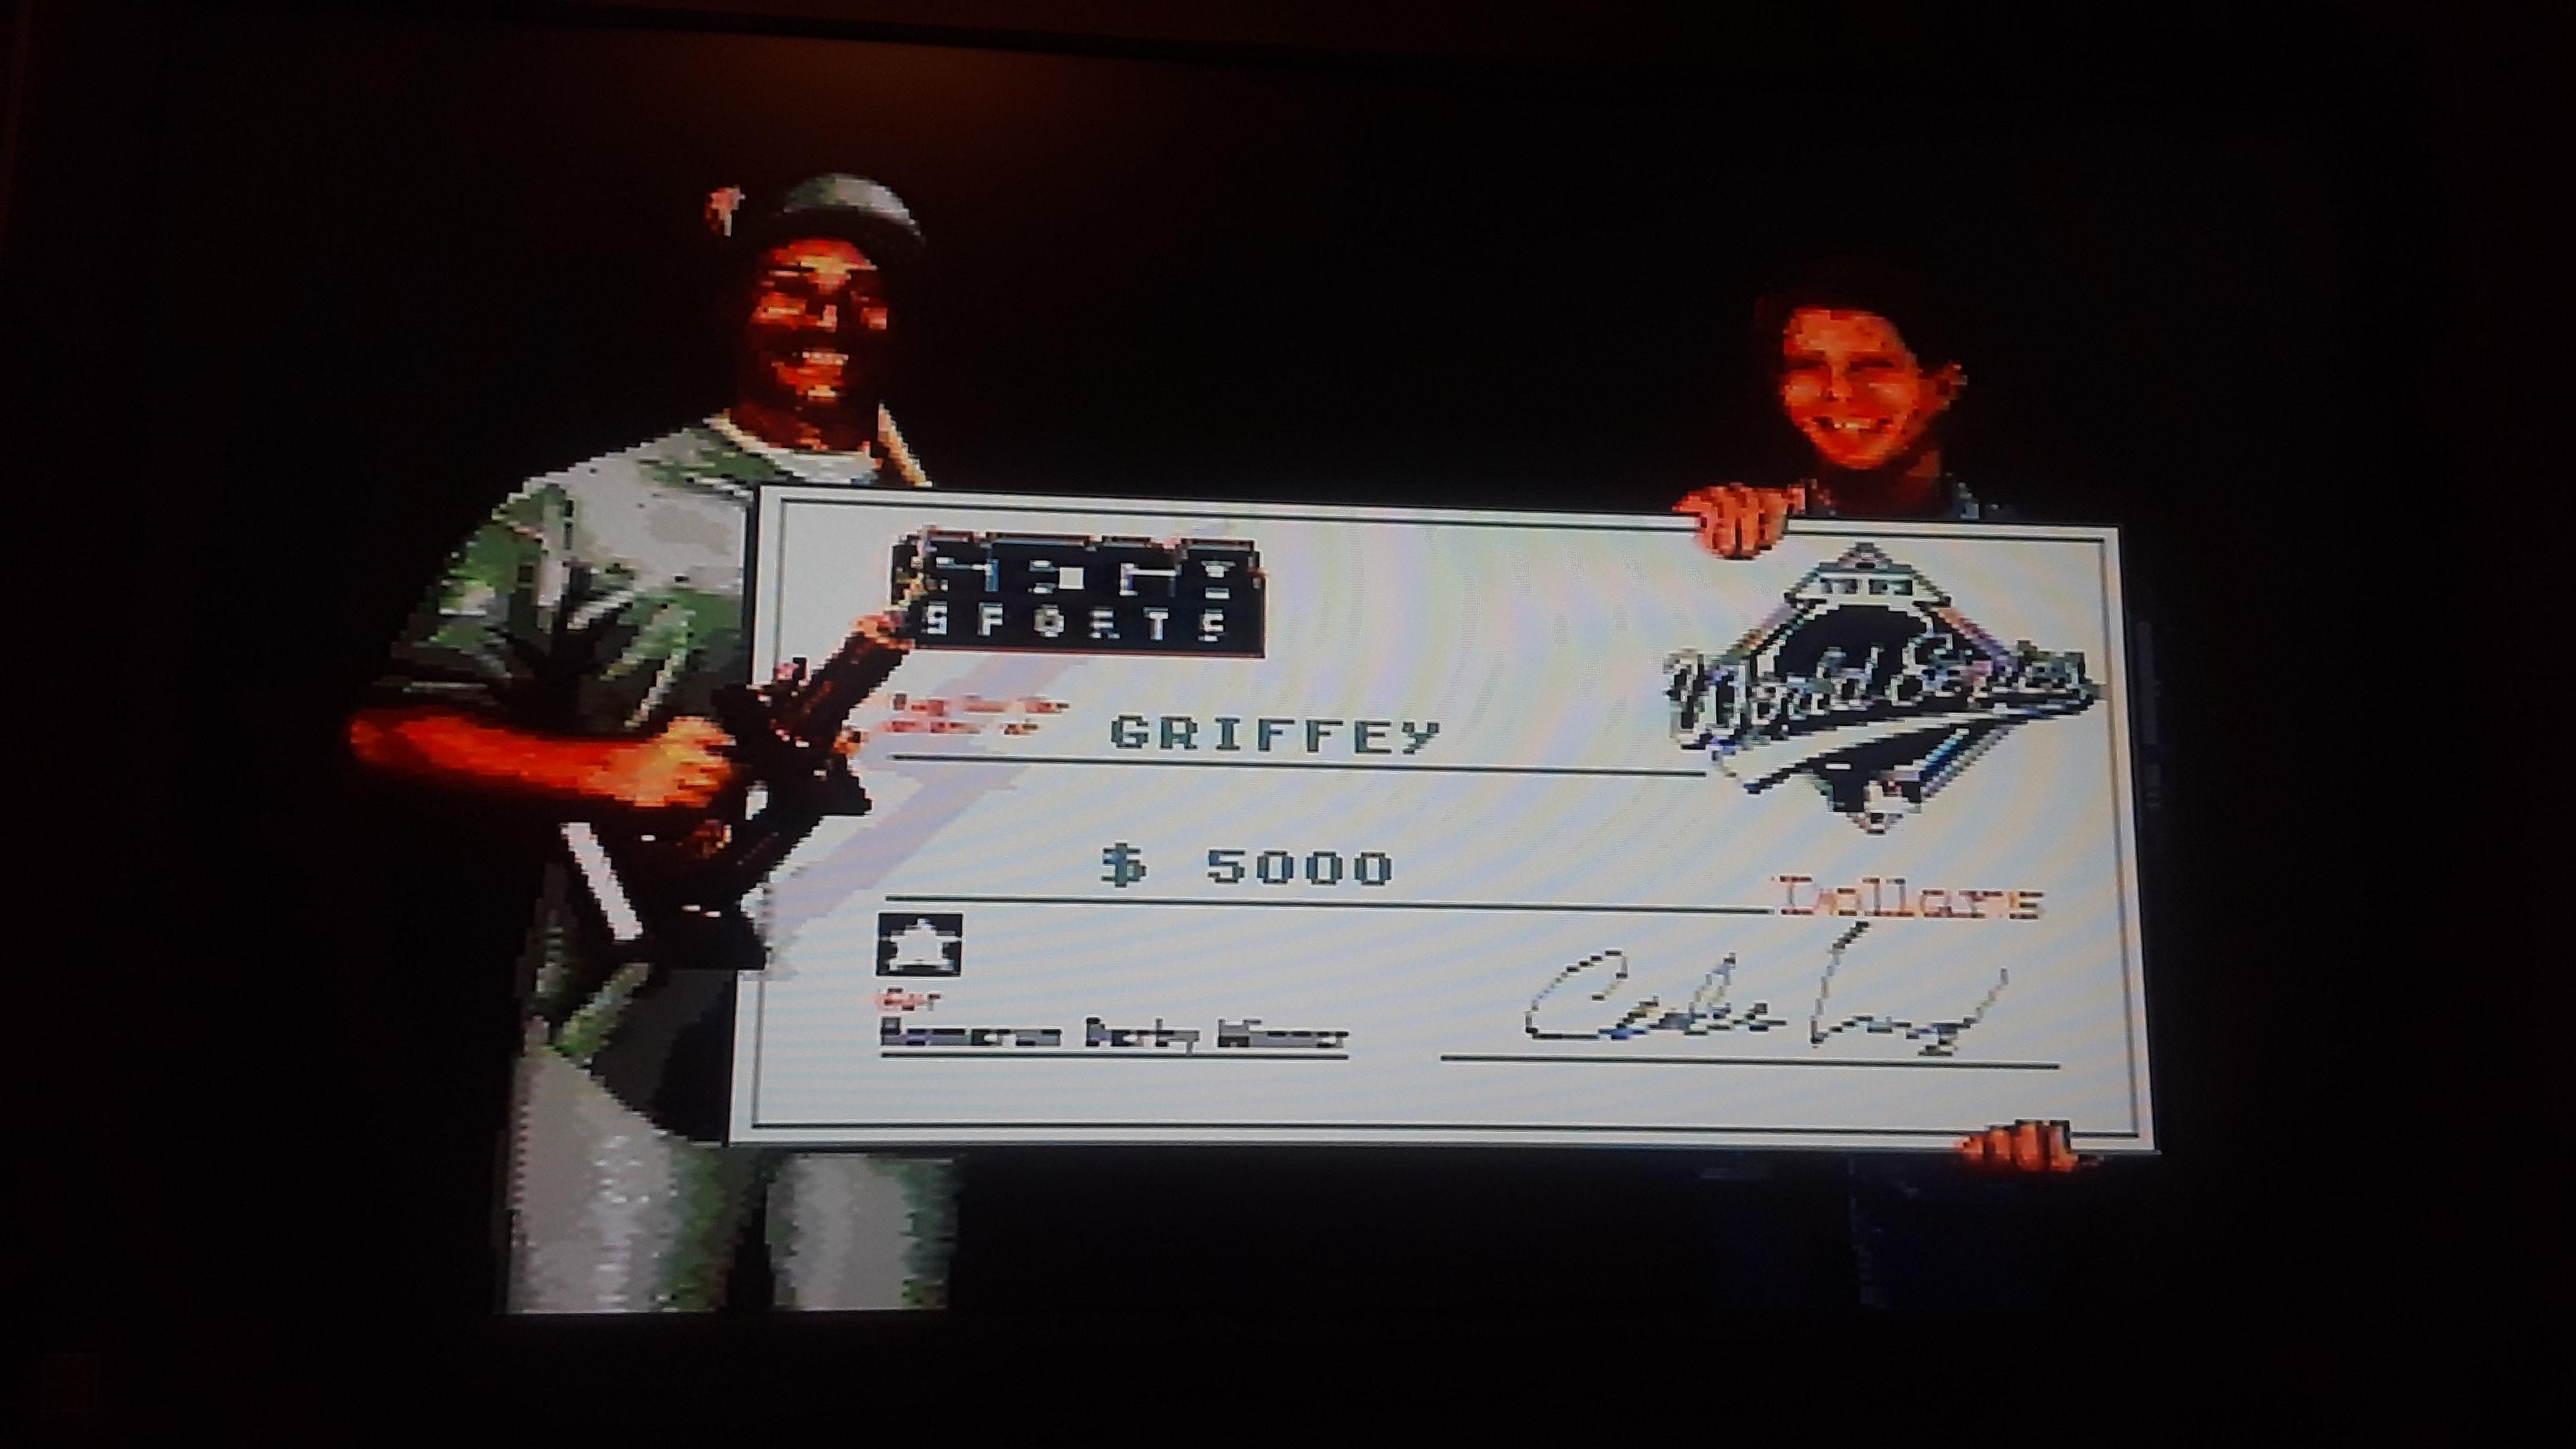 JML101582: World Series Baseball: Home Run Derby (Sega Genesis / MegaDrive Emulated) 5 points on 2019-11-16 23:36:25